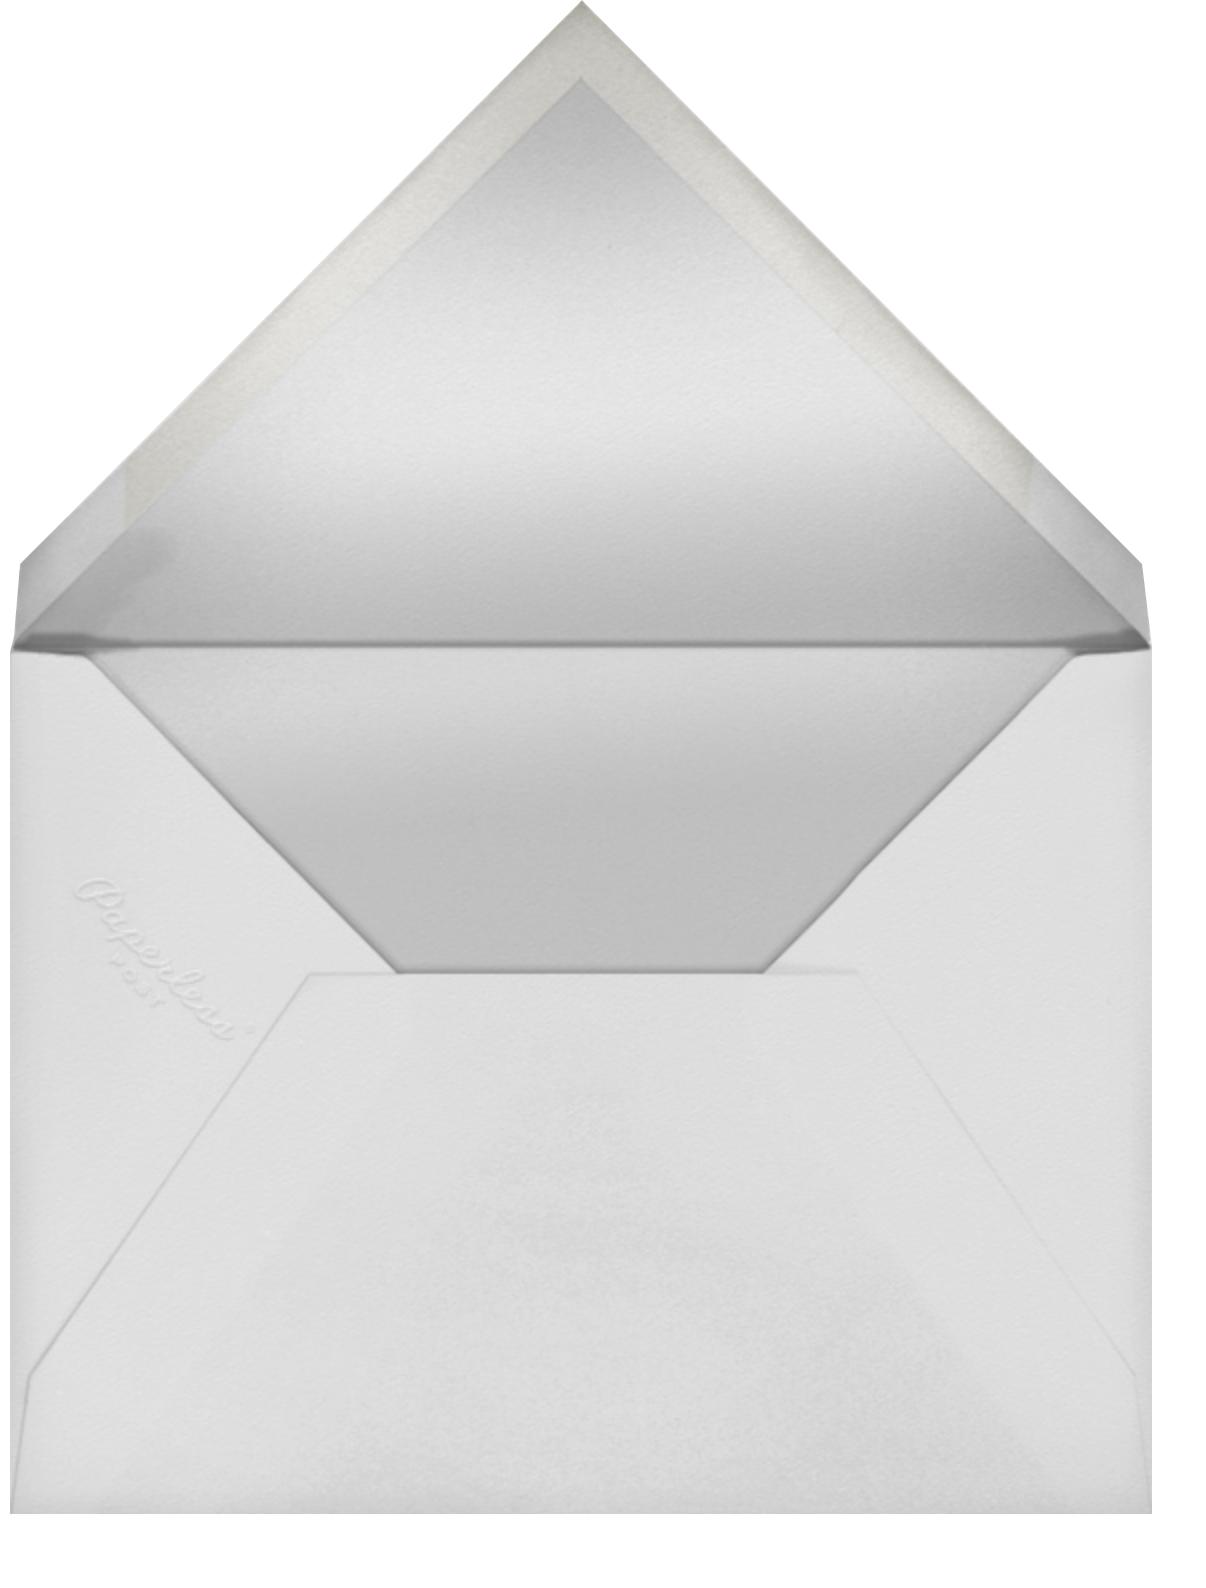 Rose Floral Ikat (Program) - Navy - Oscar de la Renta - Menus and programs - envelope back